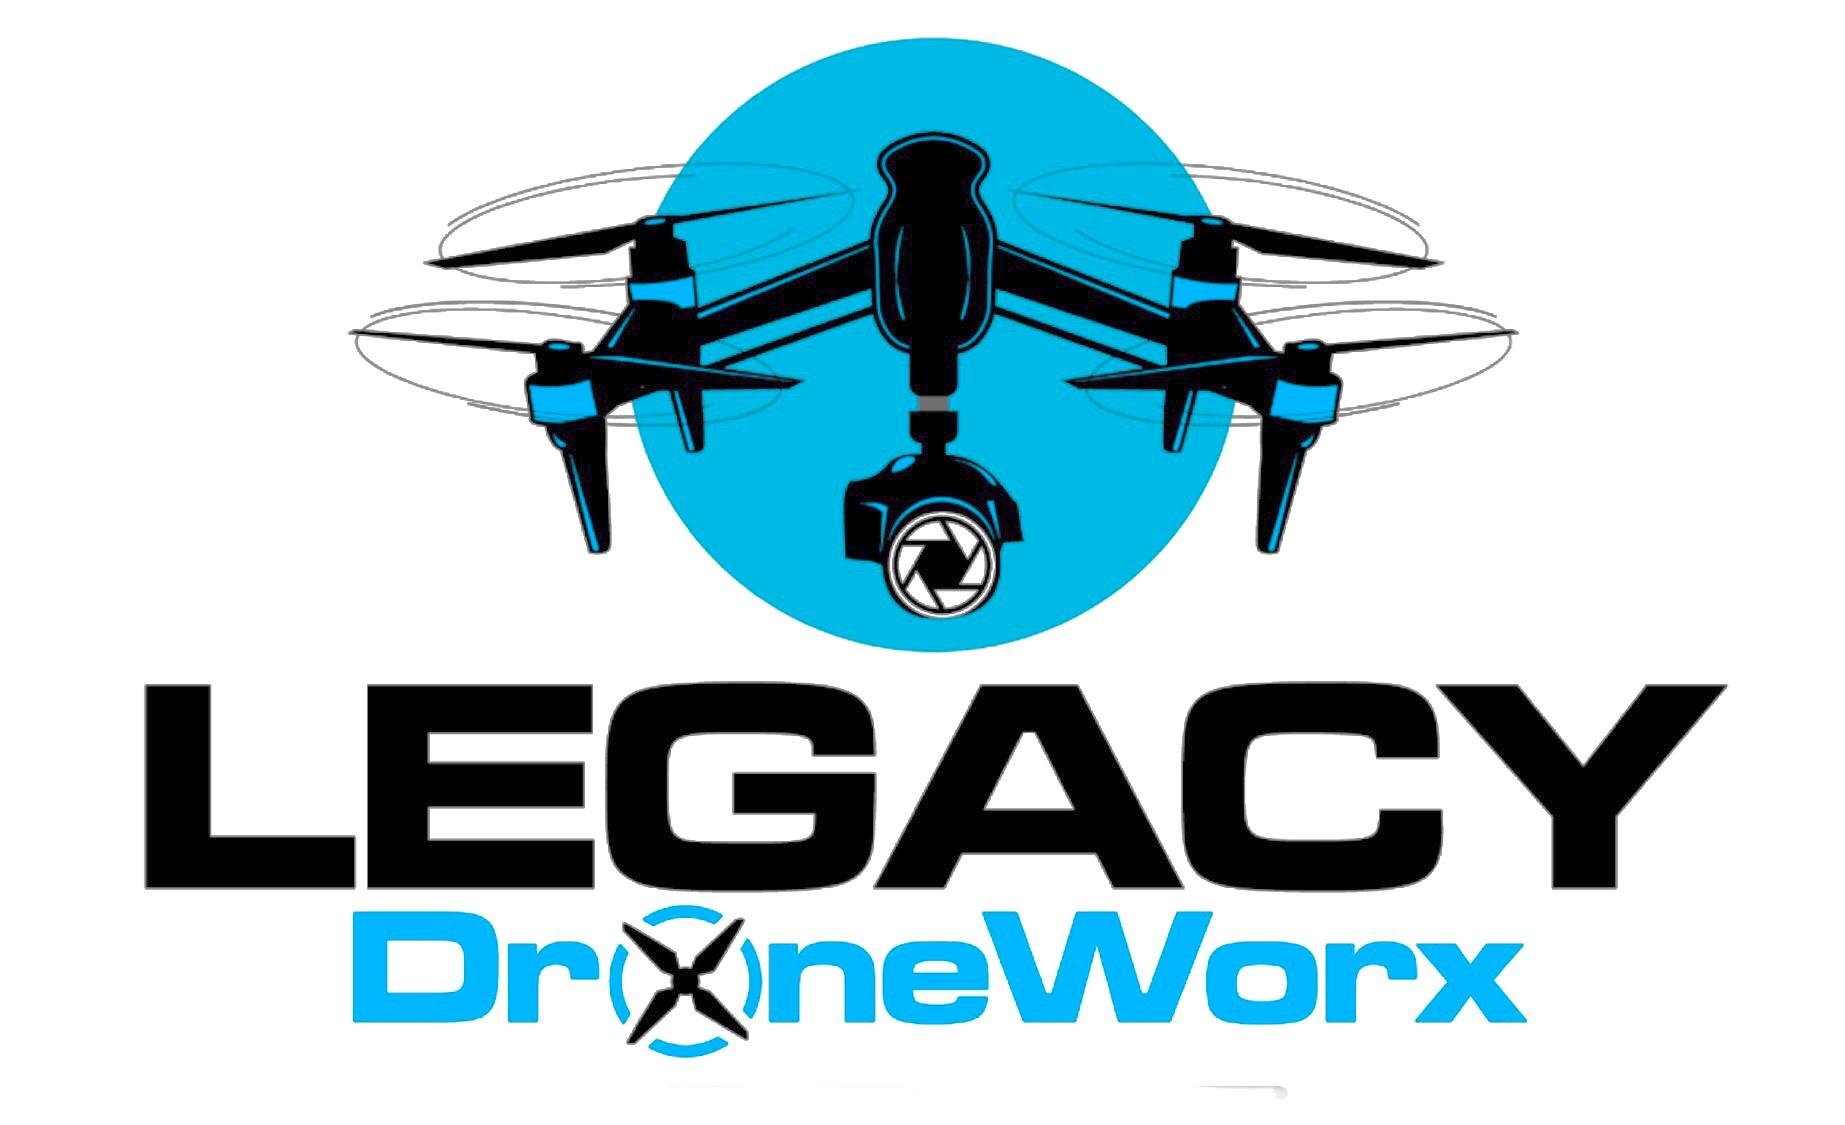 Legacy DroneWorx